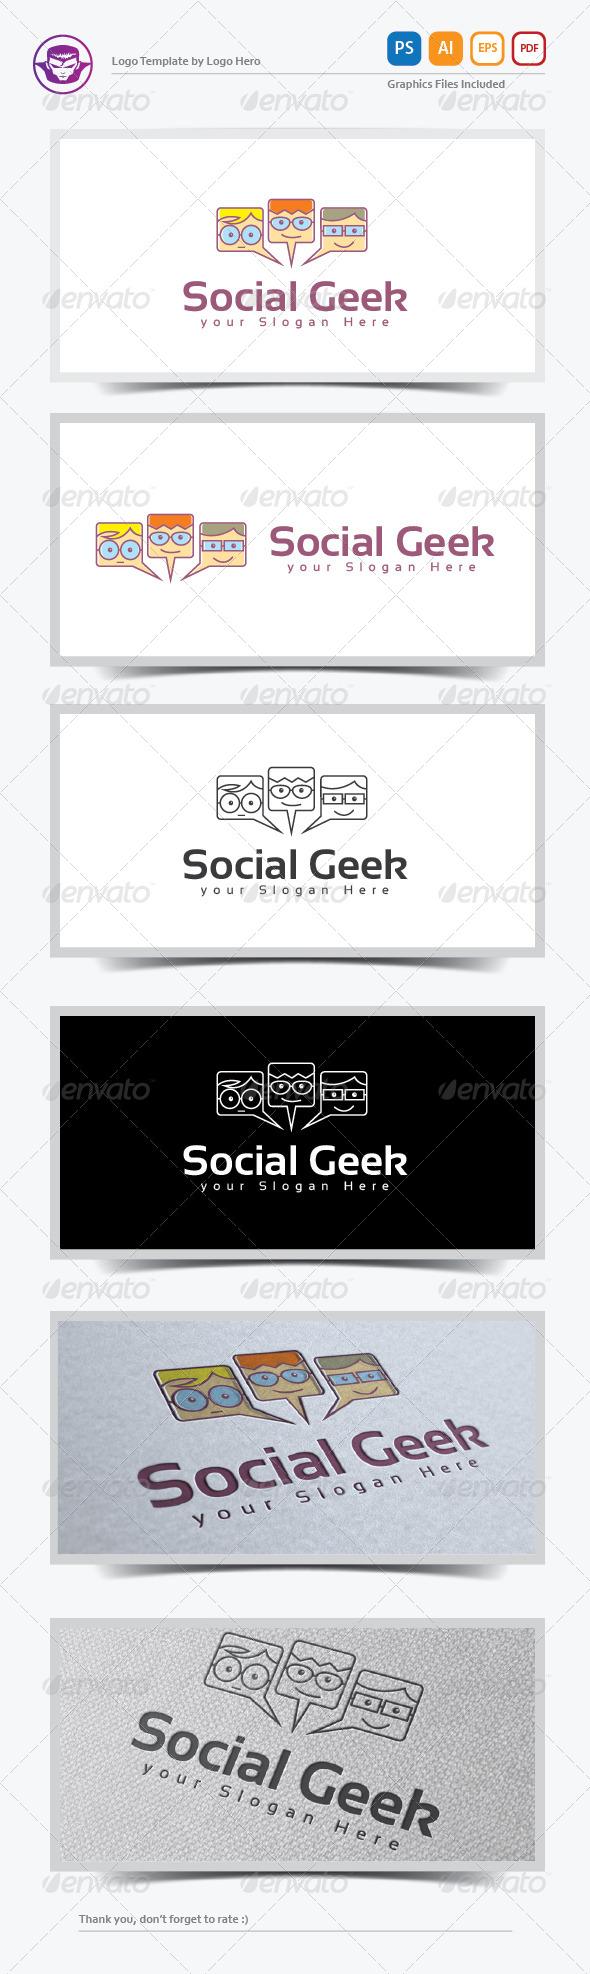 Social Geek Logo Template